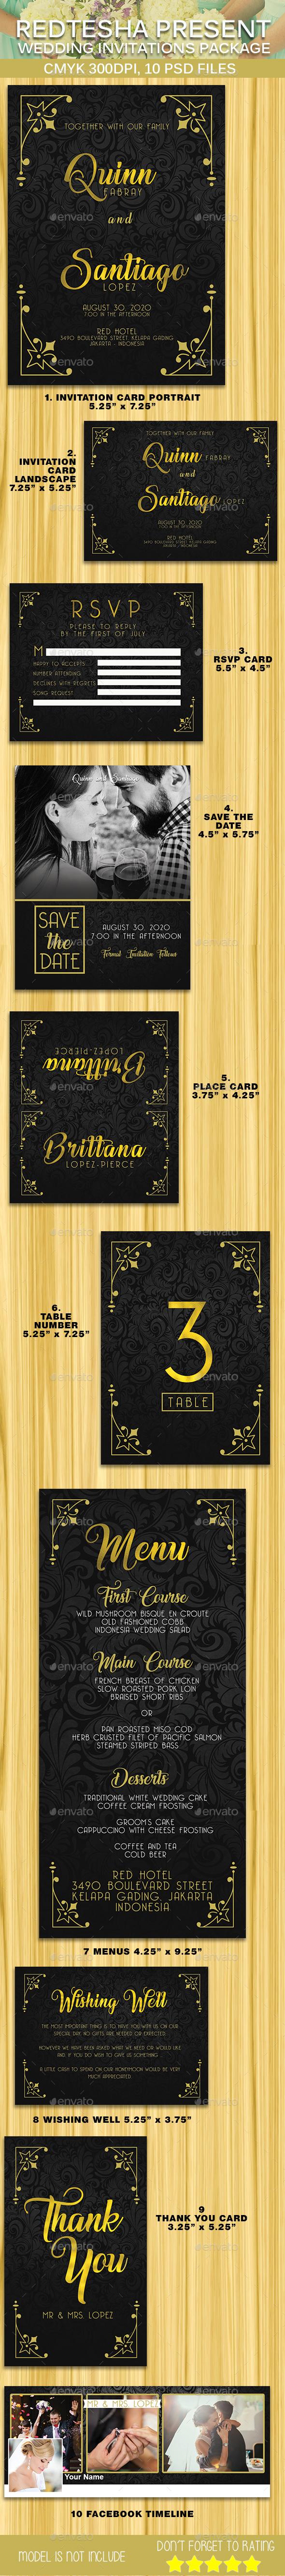 10 Wedding Invitation Package - Weddings Cards & Invites